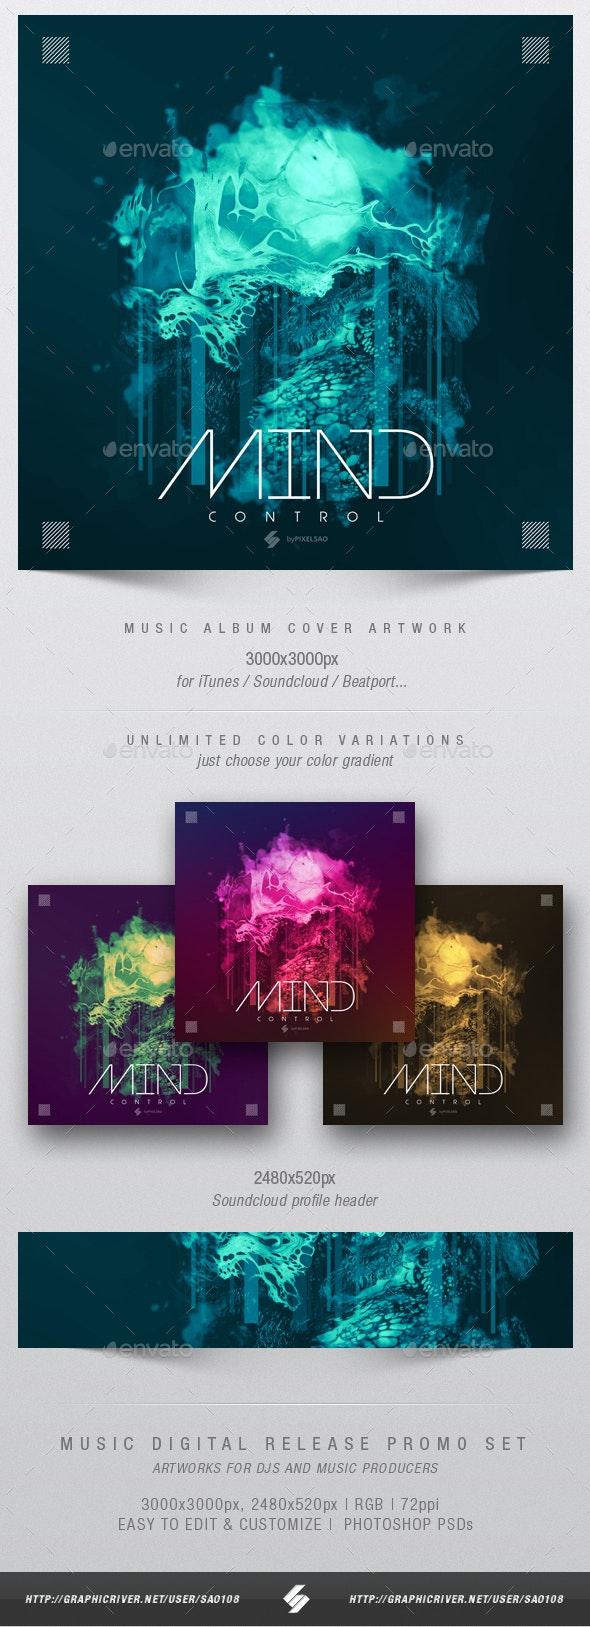 Mind Control - Progressive Music Album Cover Template - Miscellaneous Social Media